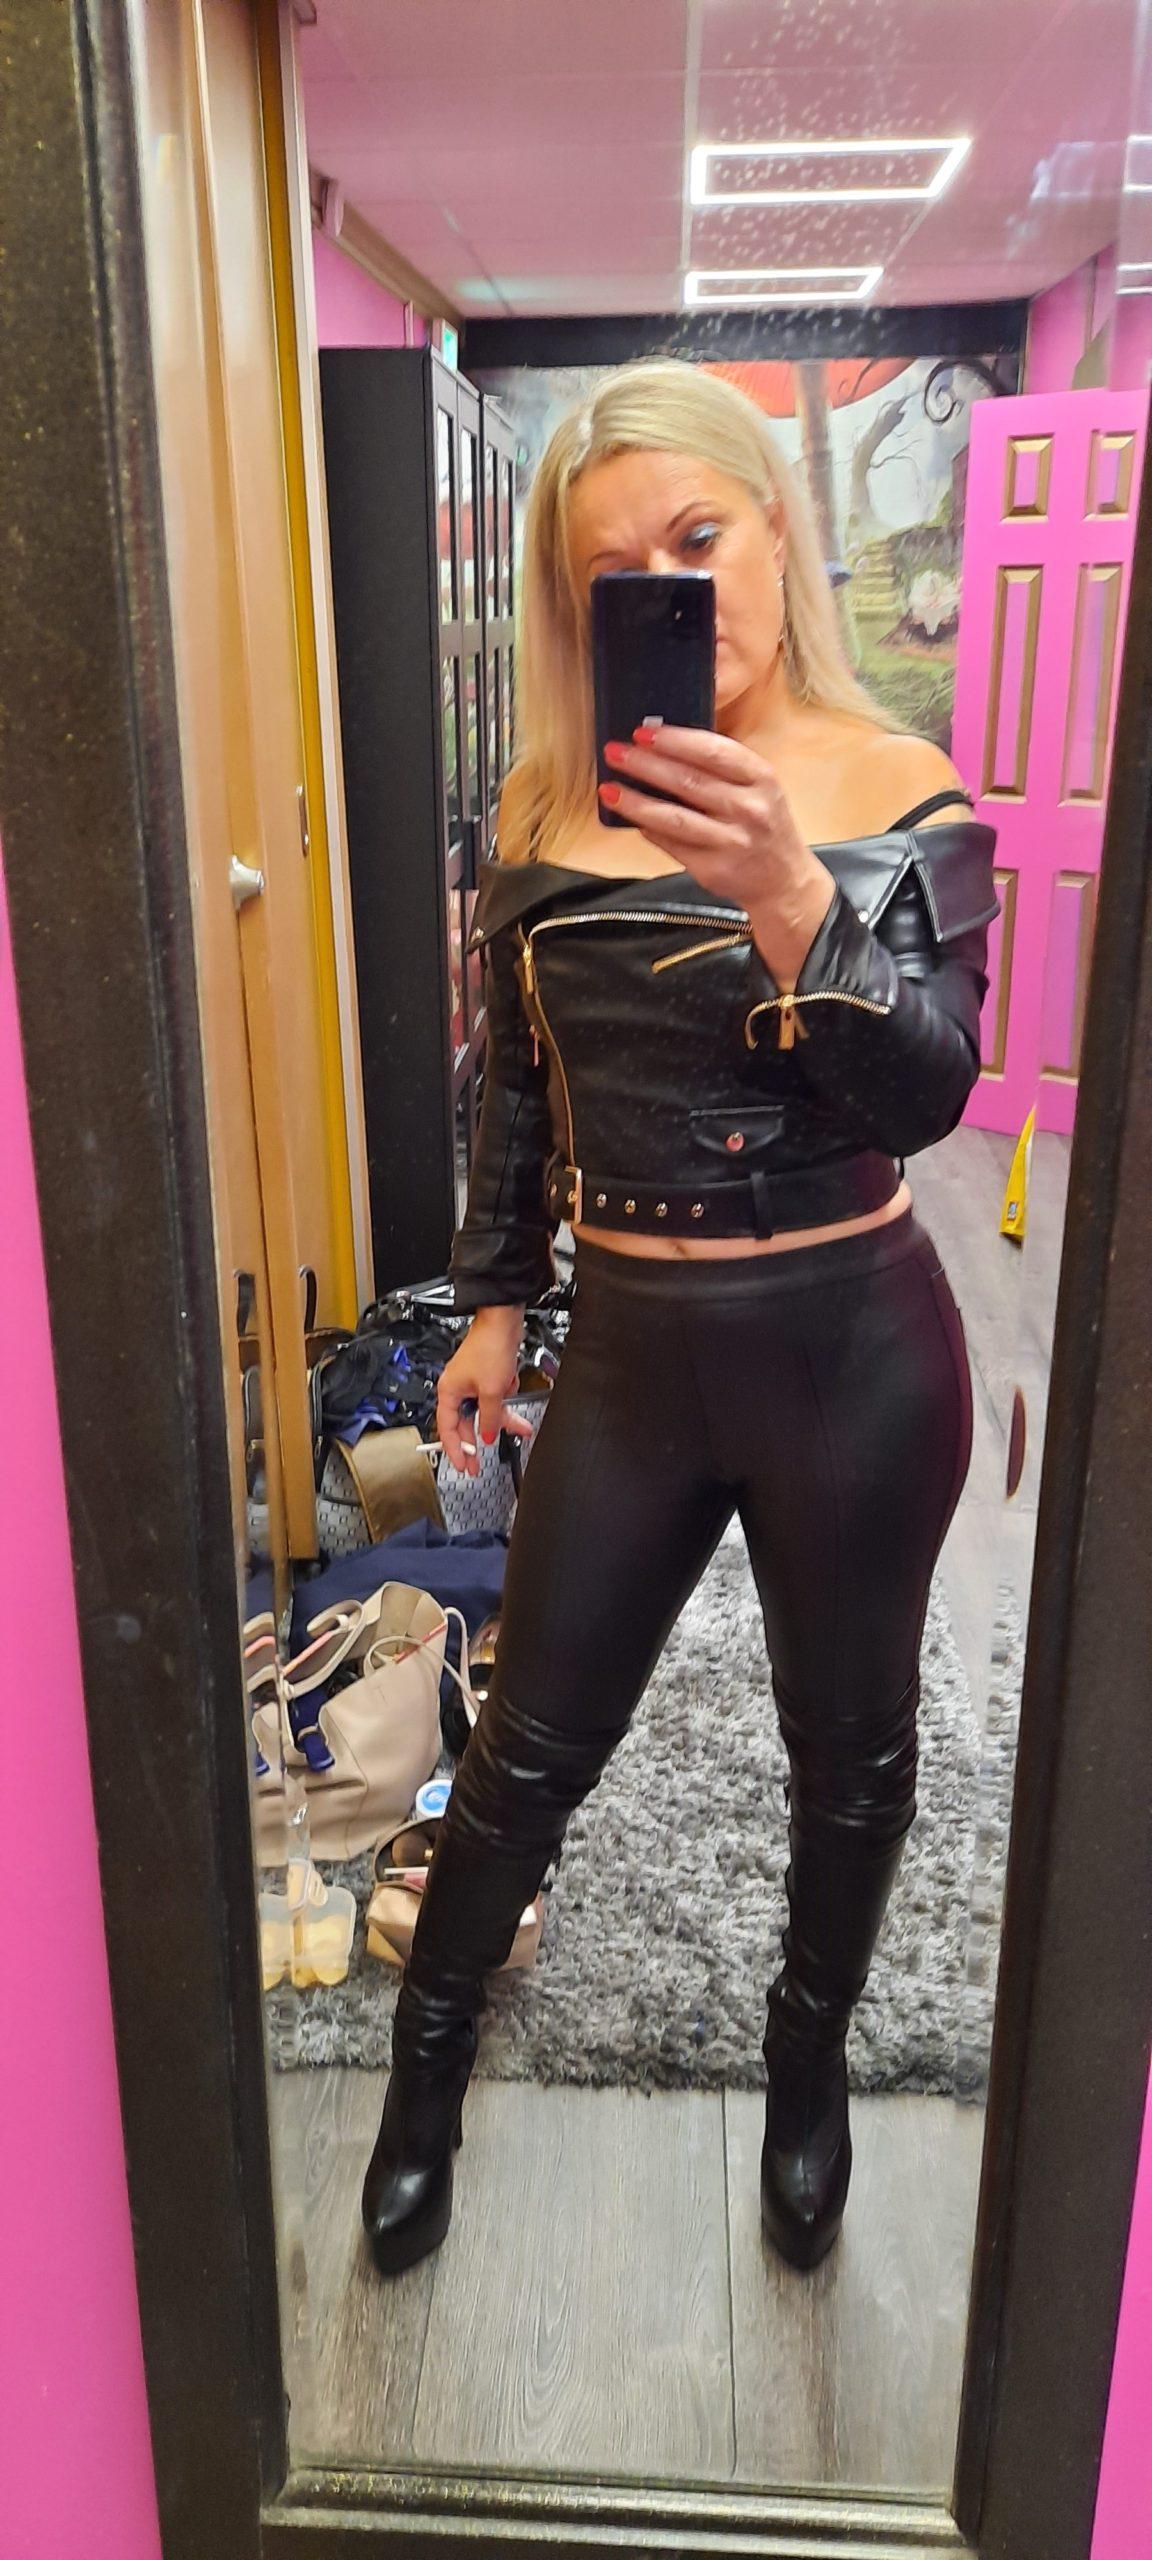 Humiliation Online, Mistress Athena , Kneel Submit , control